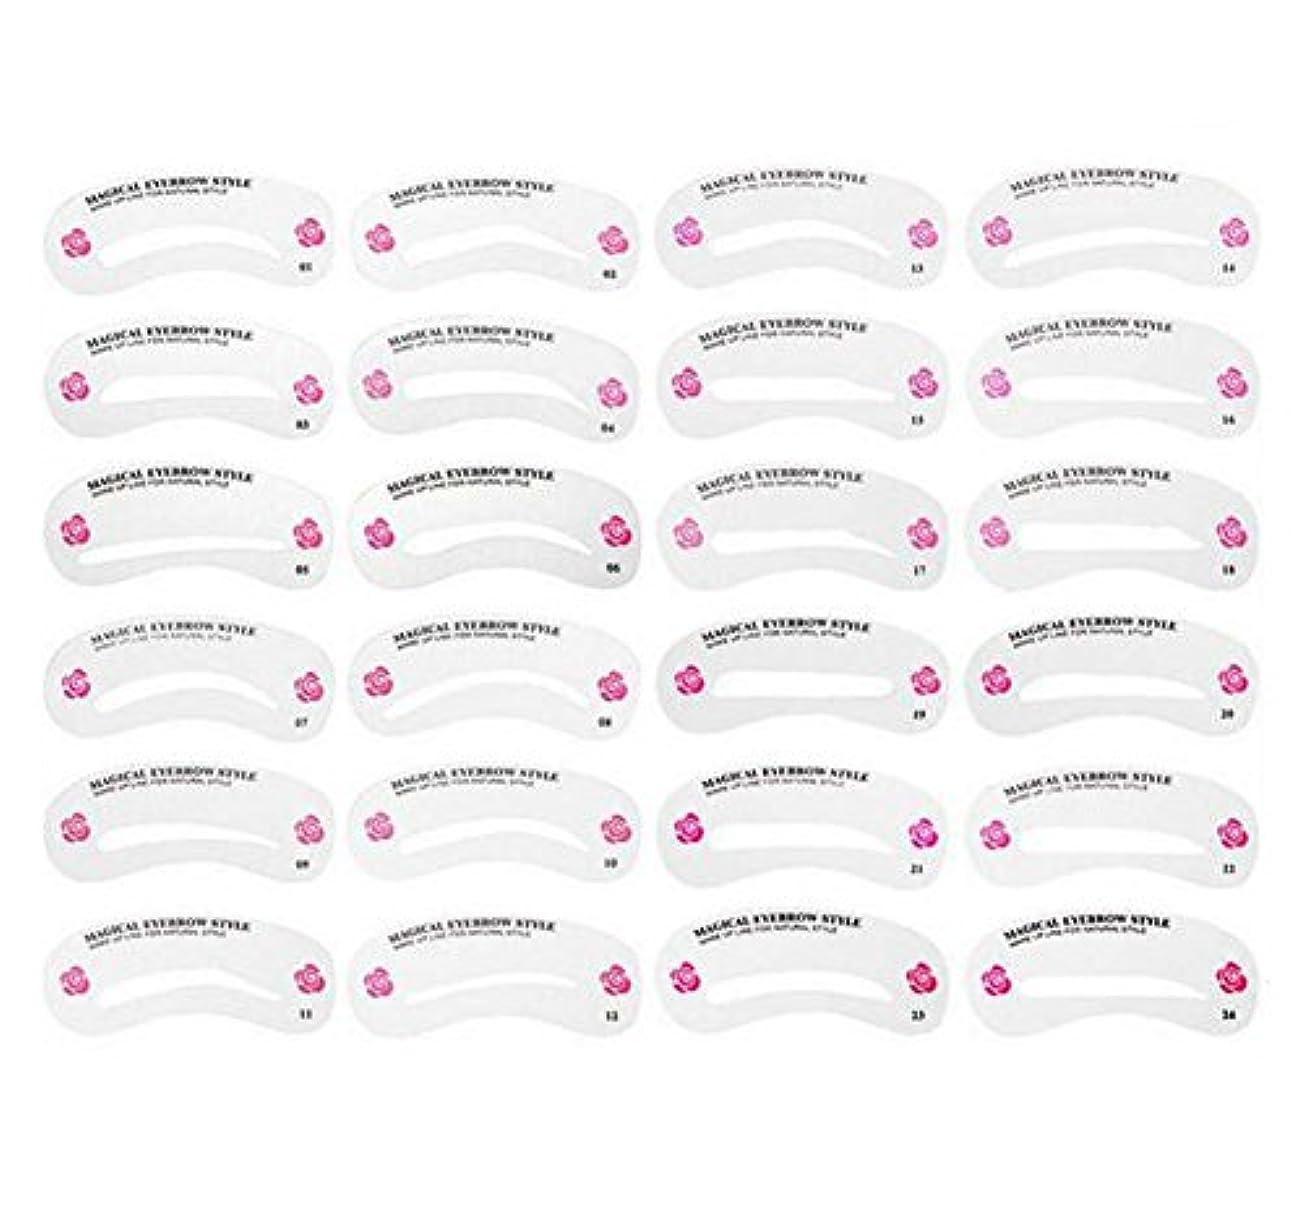 24PCS 眉毛ステンシル眉毛グルーミングステンシルカードキットソフトマジック簡単メイクシェーピングテンプレートDIY美容女性女の子のためのツールとレディース-24スタイル